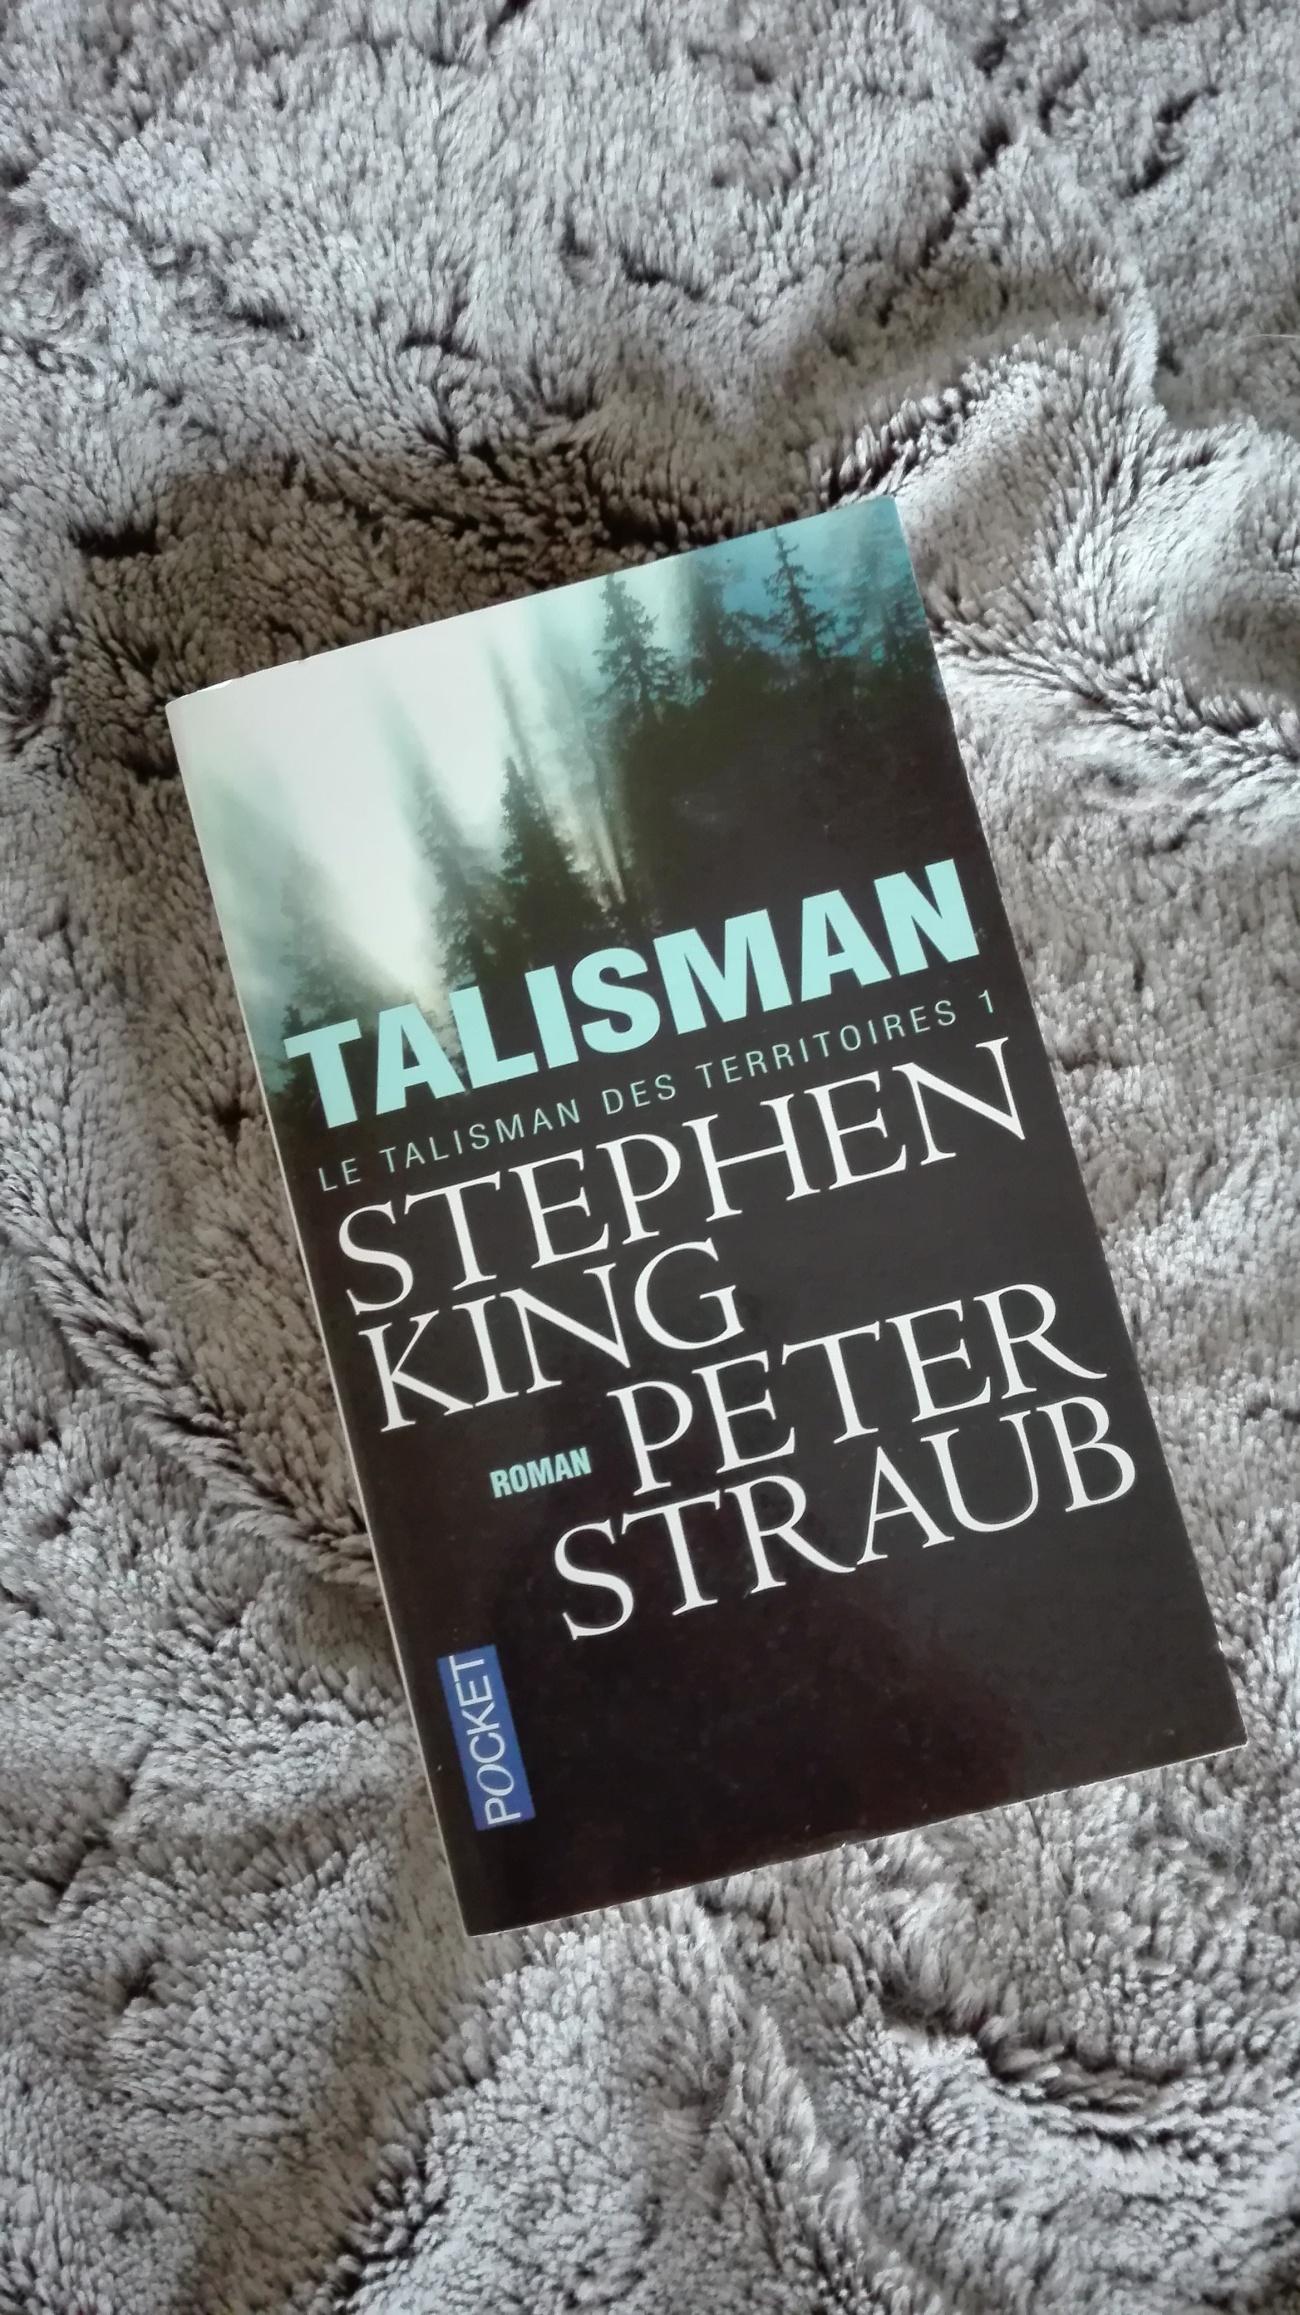 tomabooks-le-talisman-des-territoires-stephen-king-peter-straub